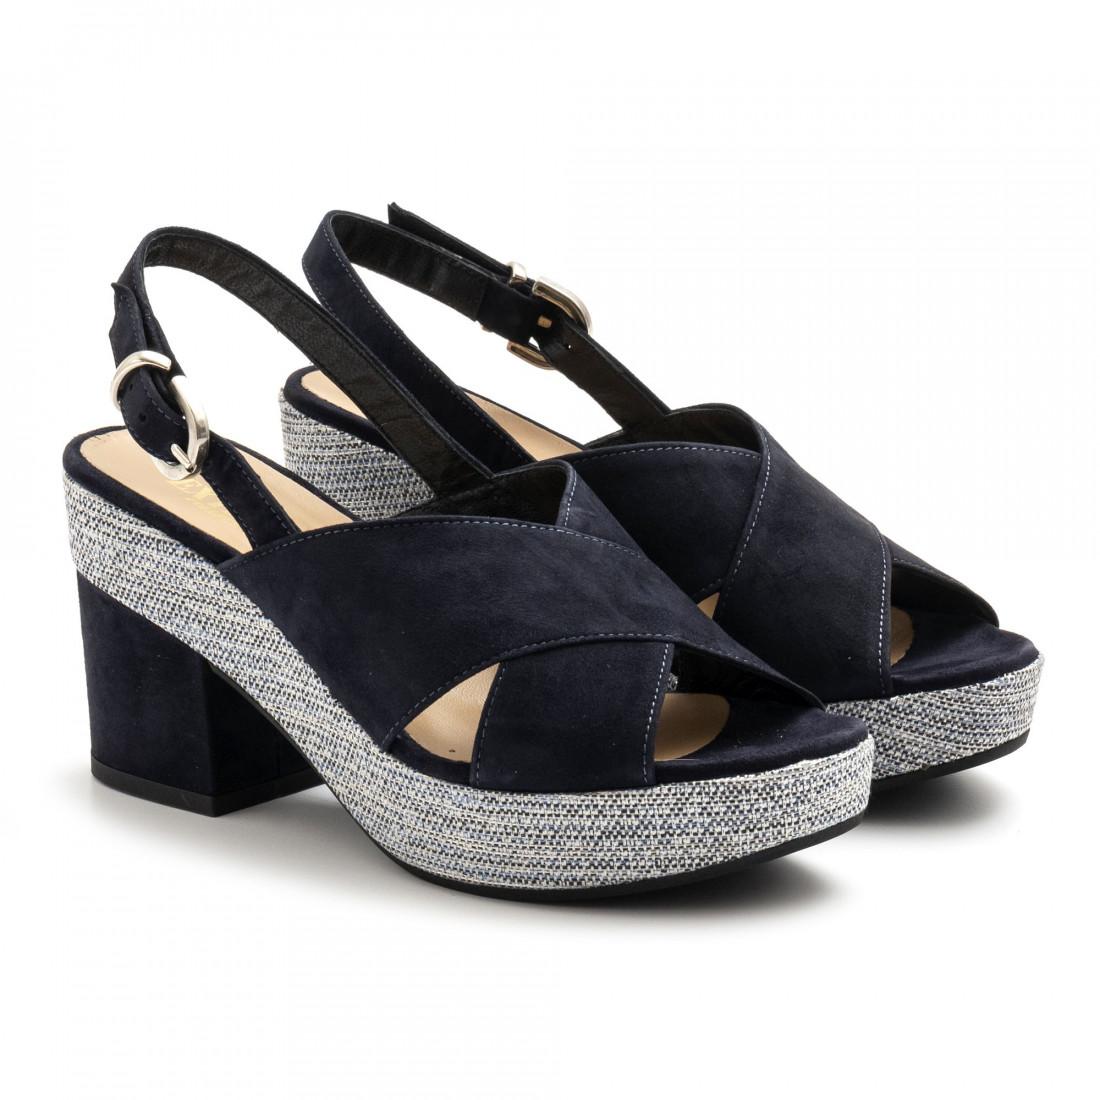 sandals woman extreme 2663camoscio blu 4915